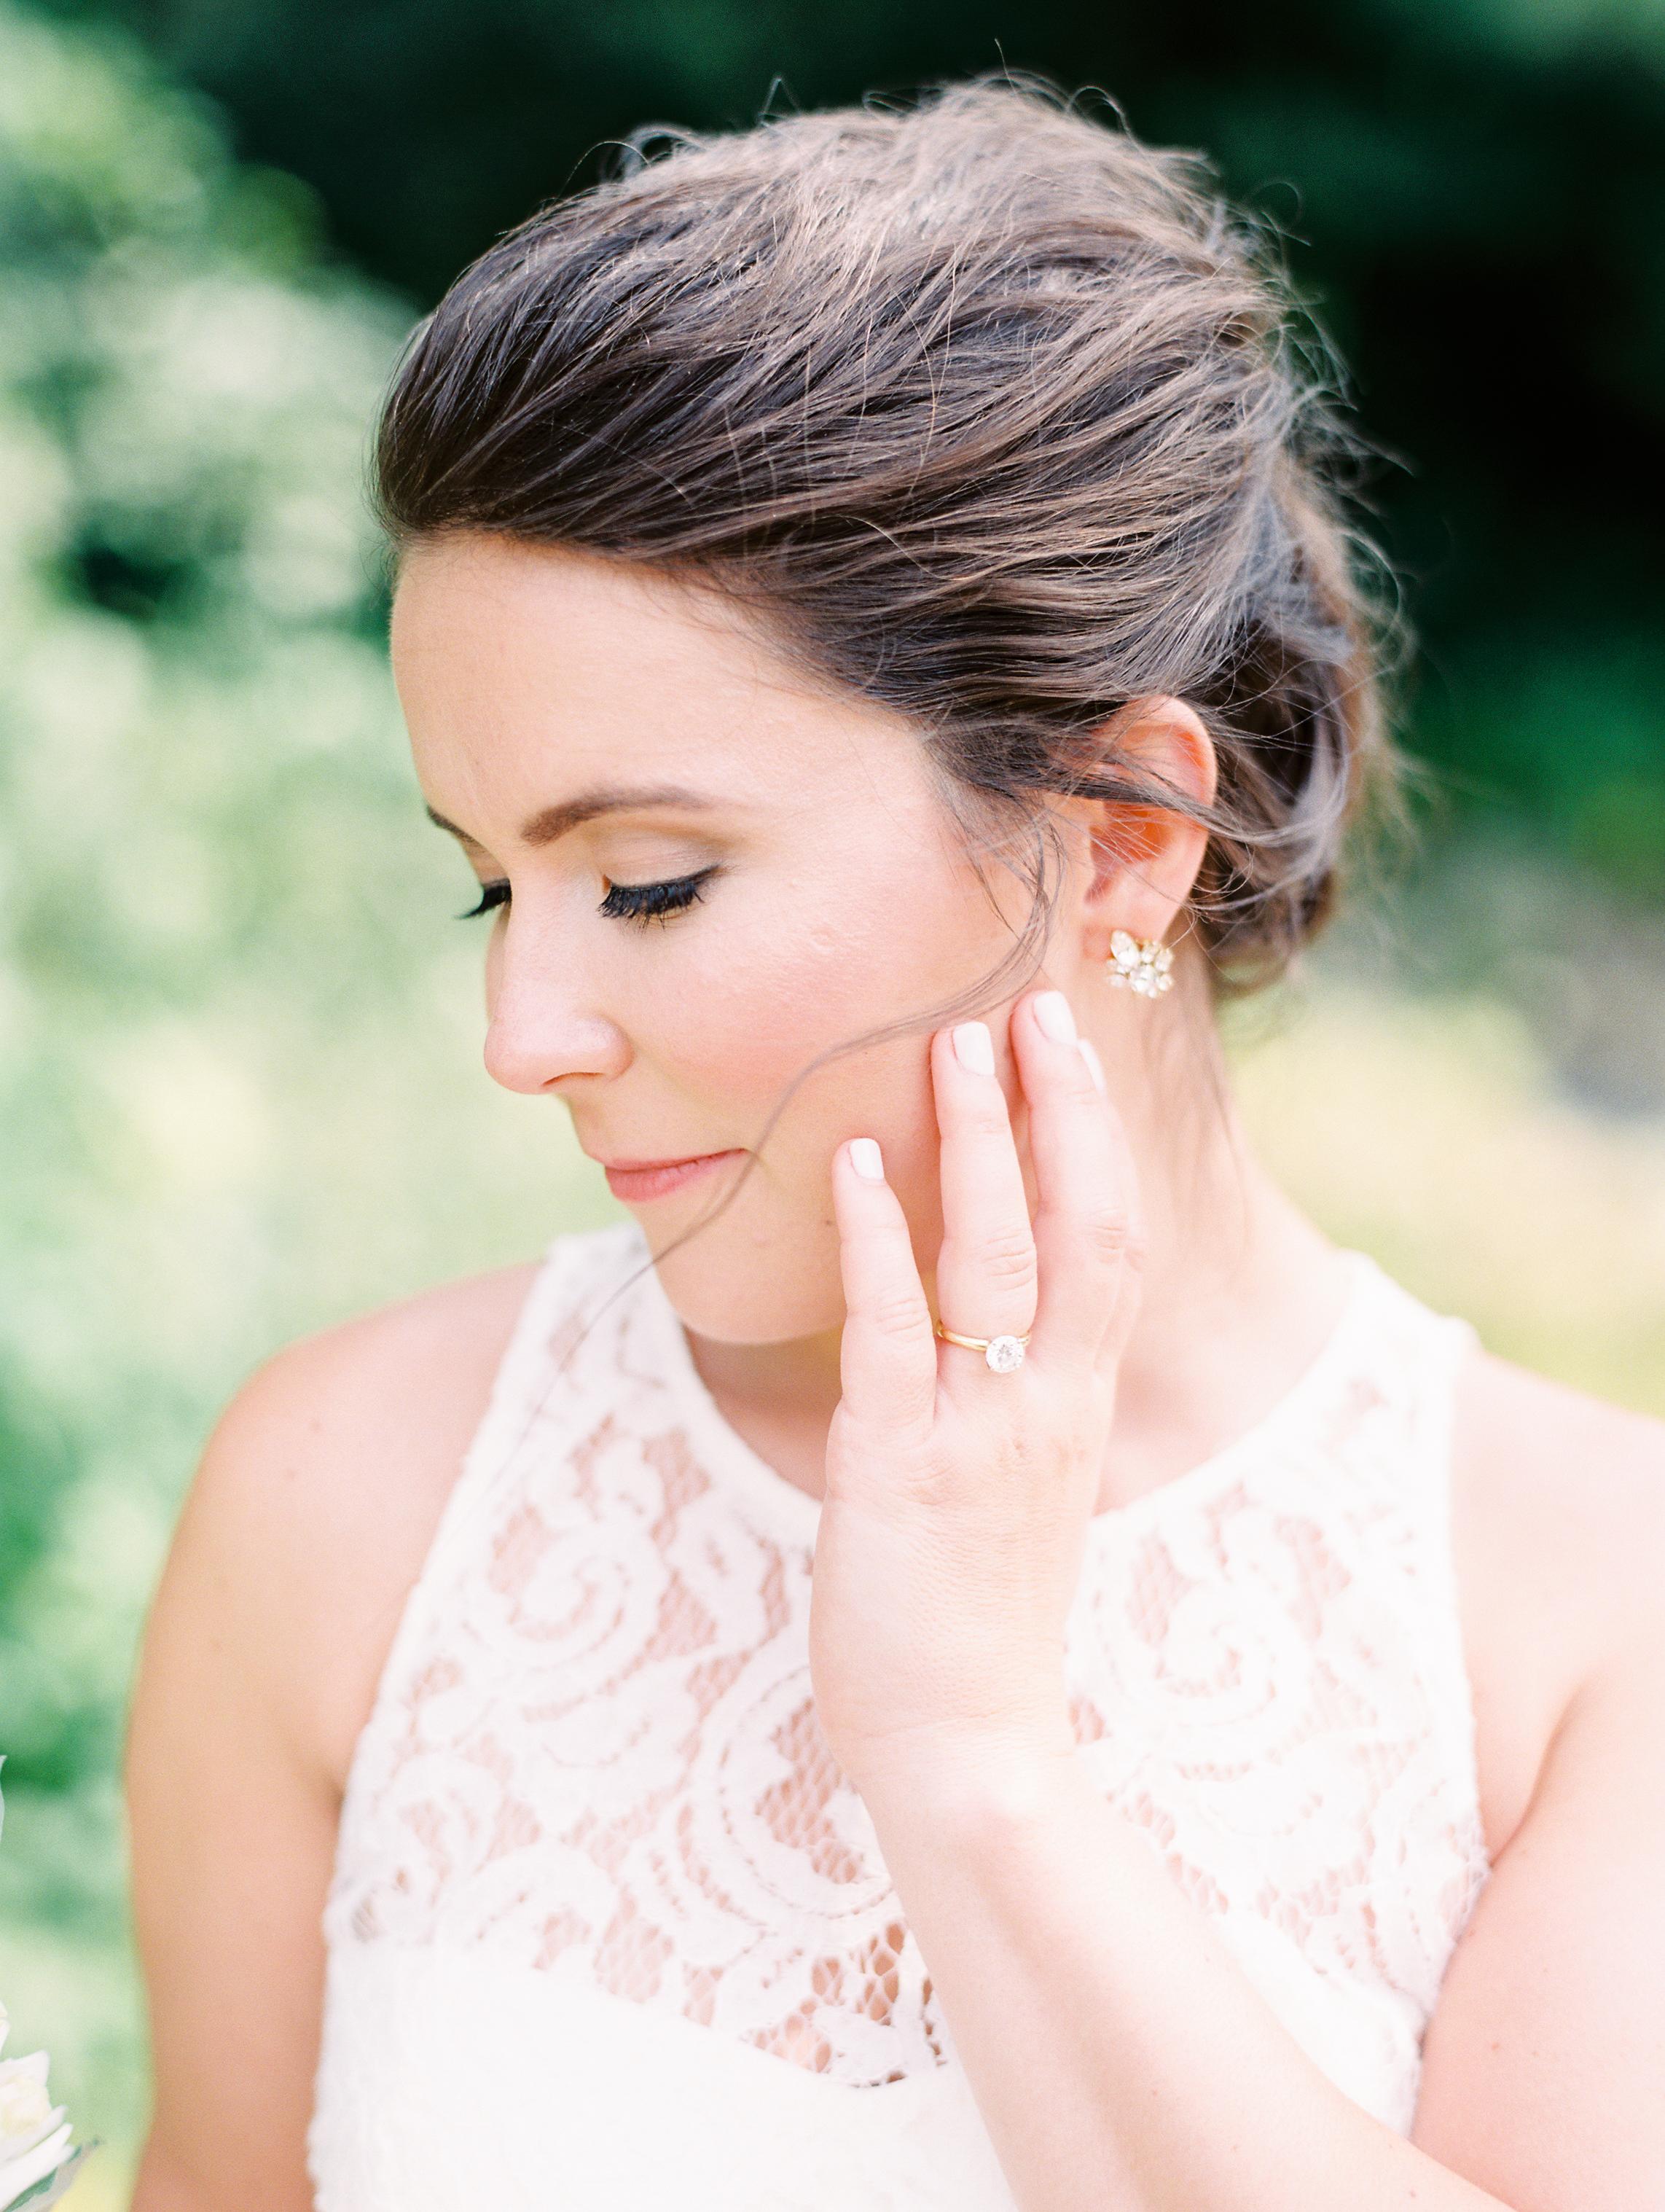 Zoller+Wedding+Bridal+Partyf-38.jpg